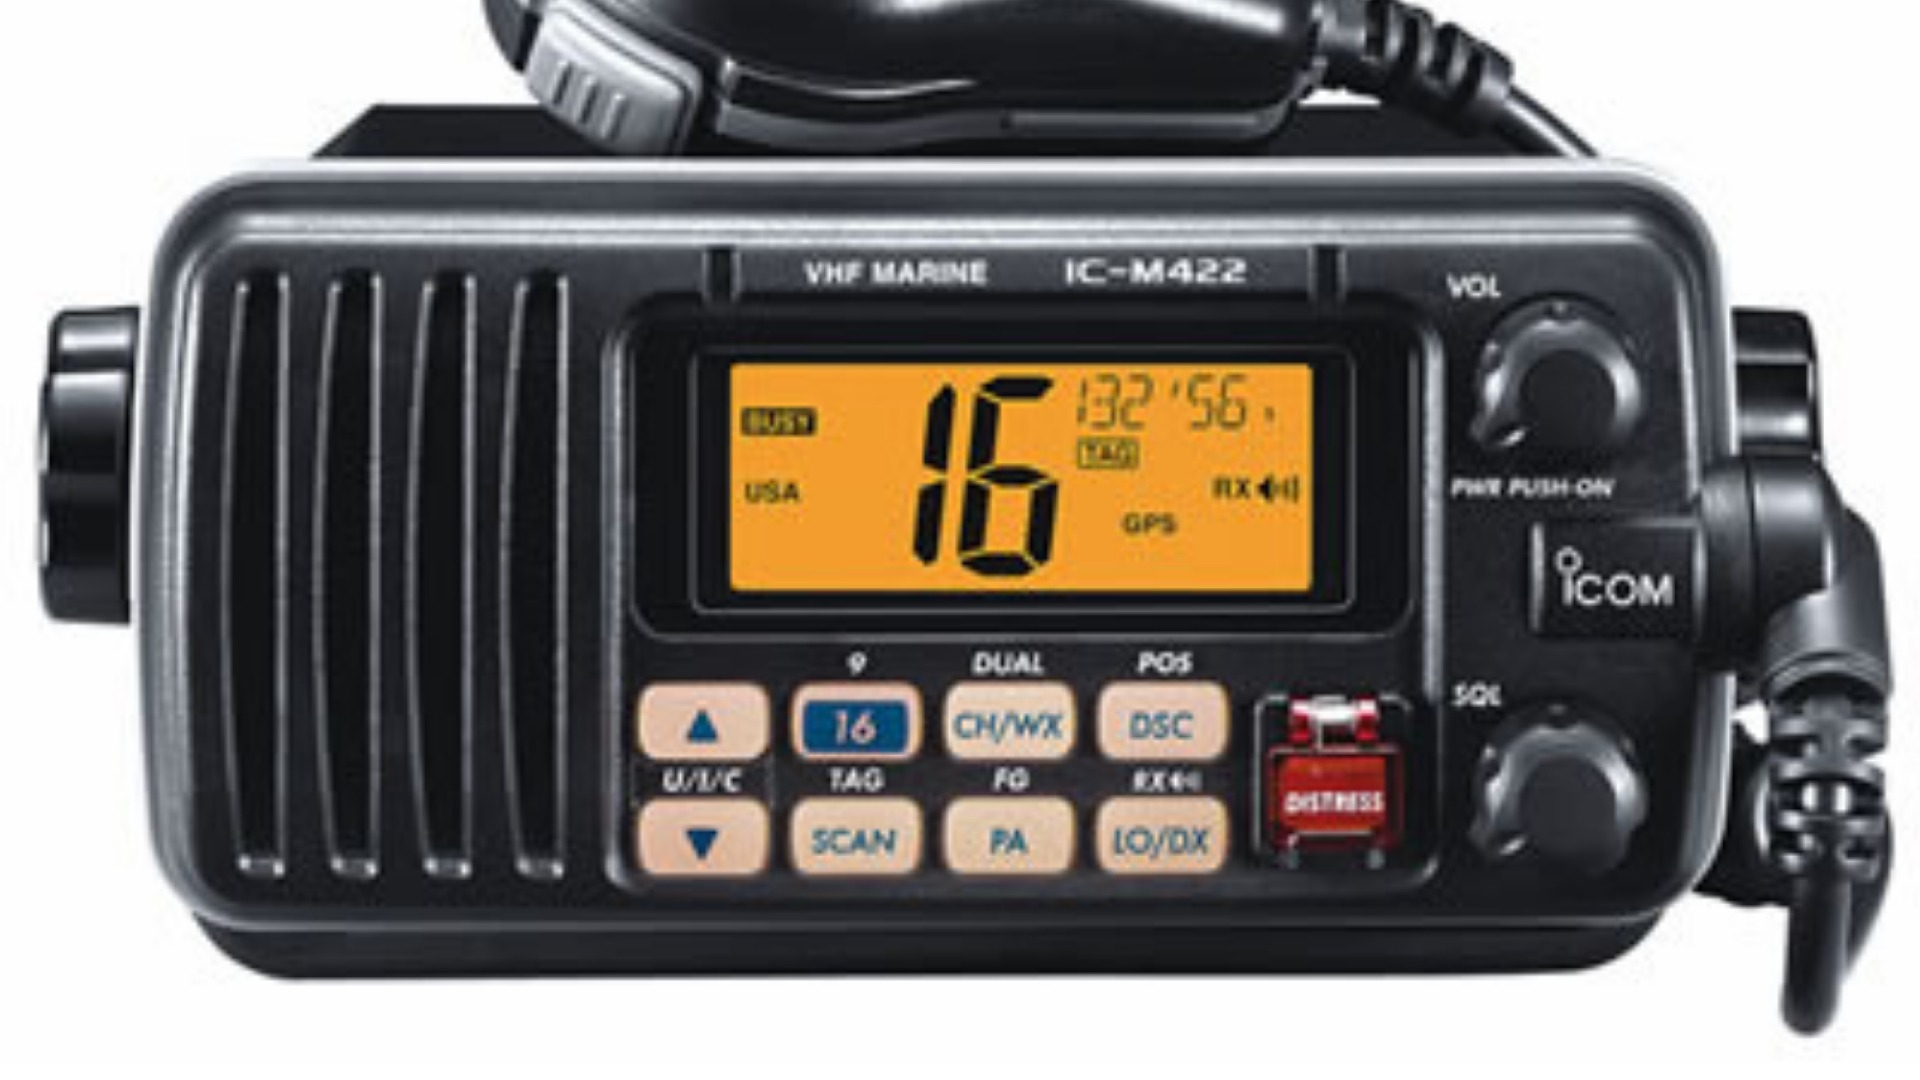 ICOM VHF radio set